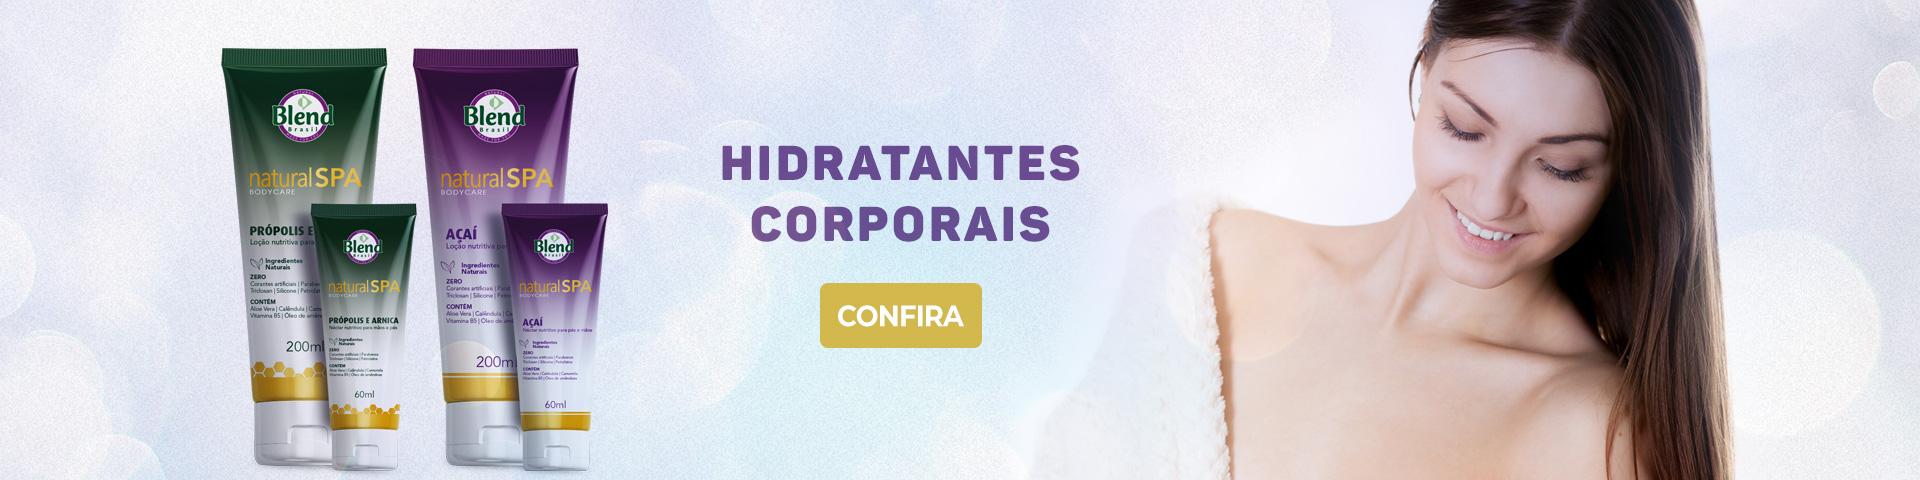 Hidratantes Corporais